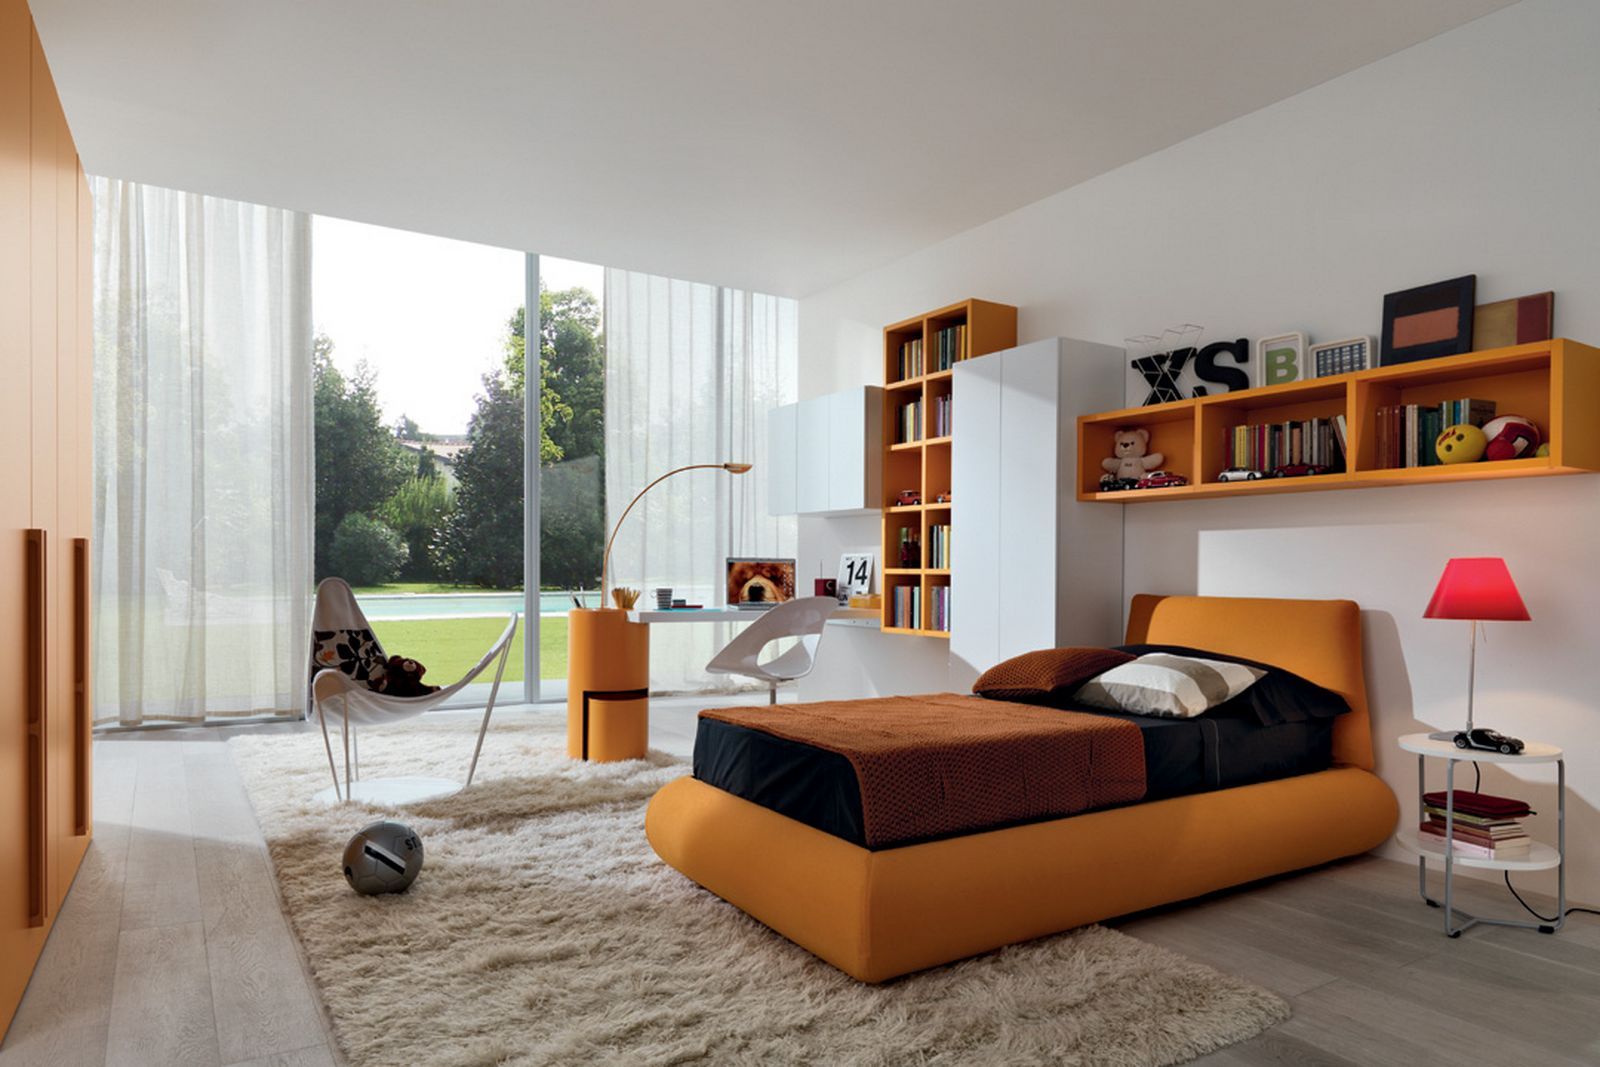 Bedroom closets ideas Photo - 1